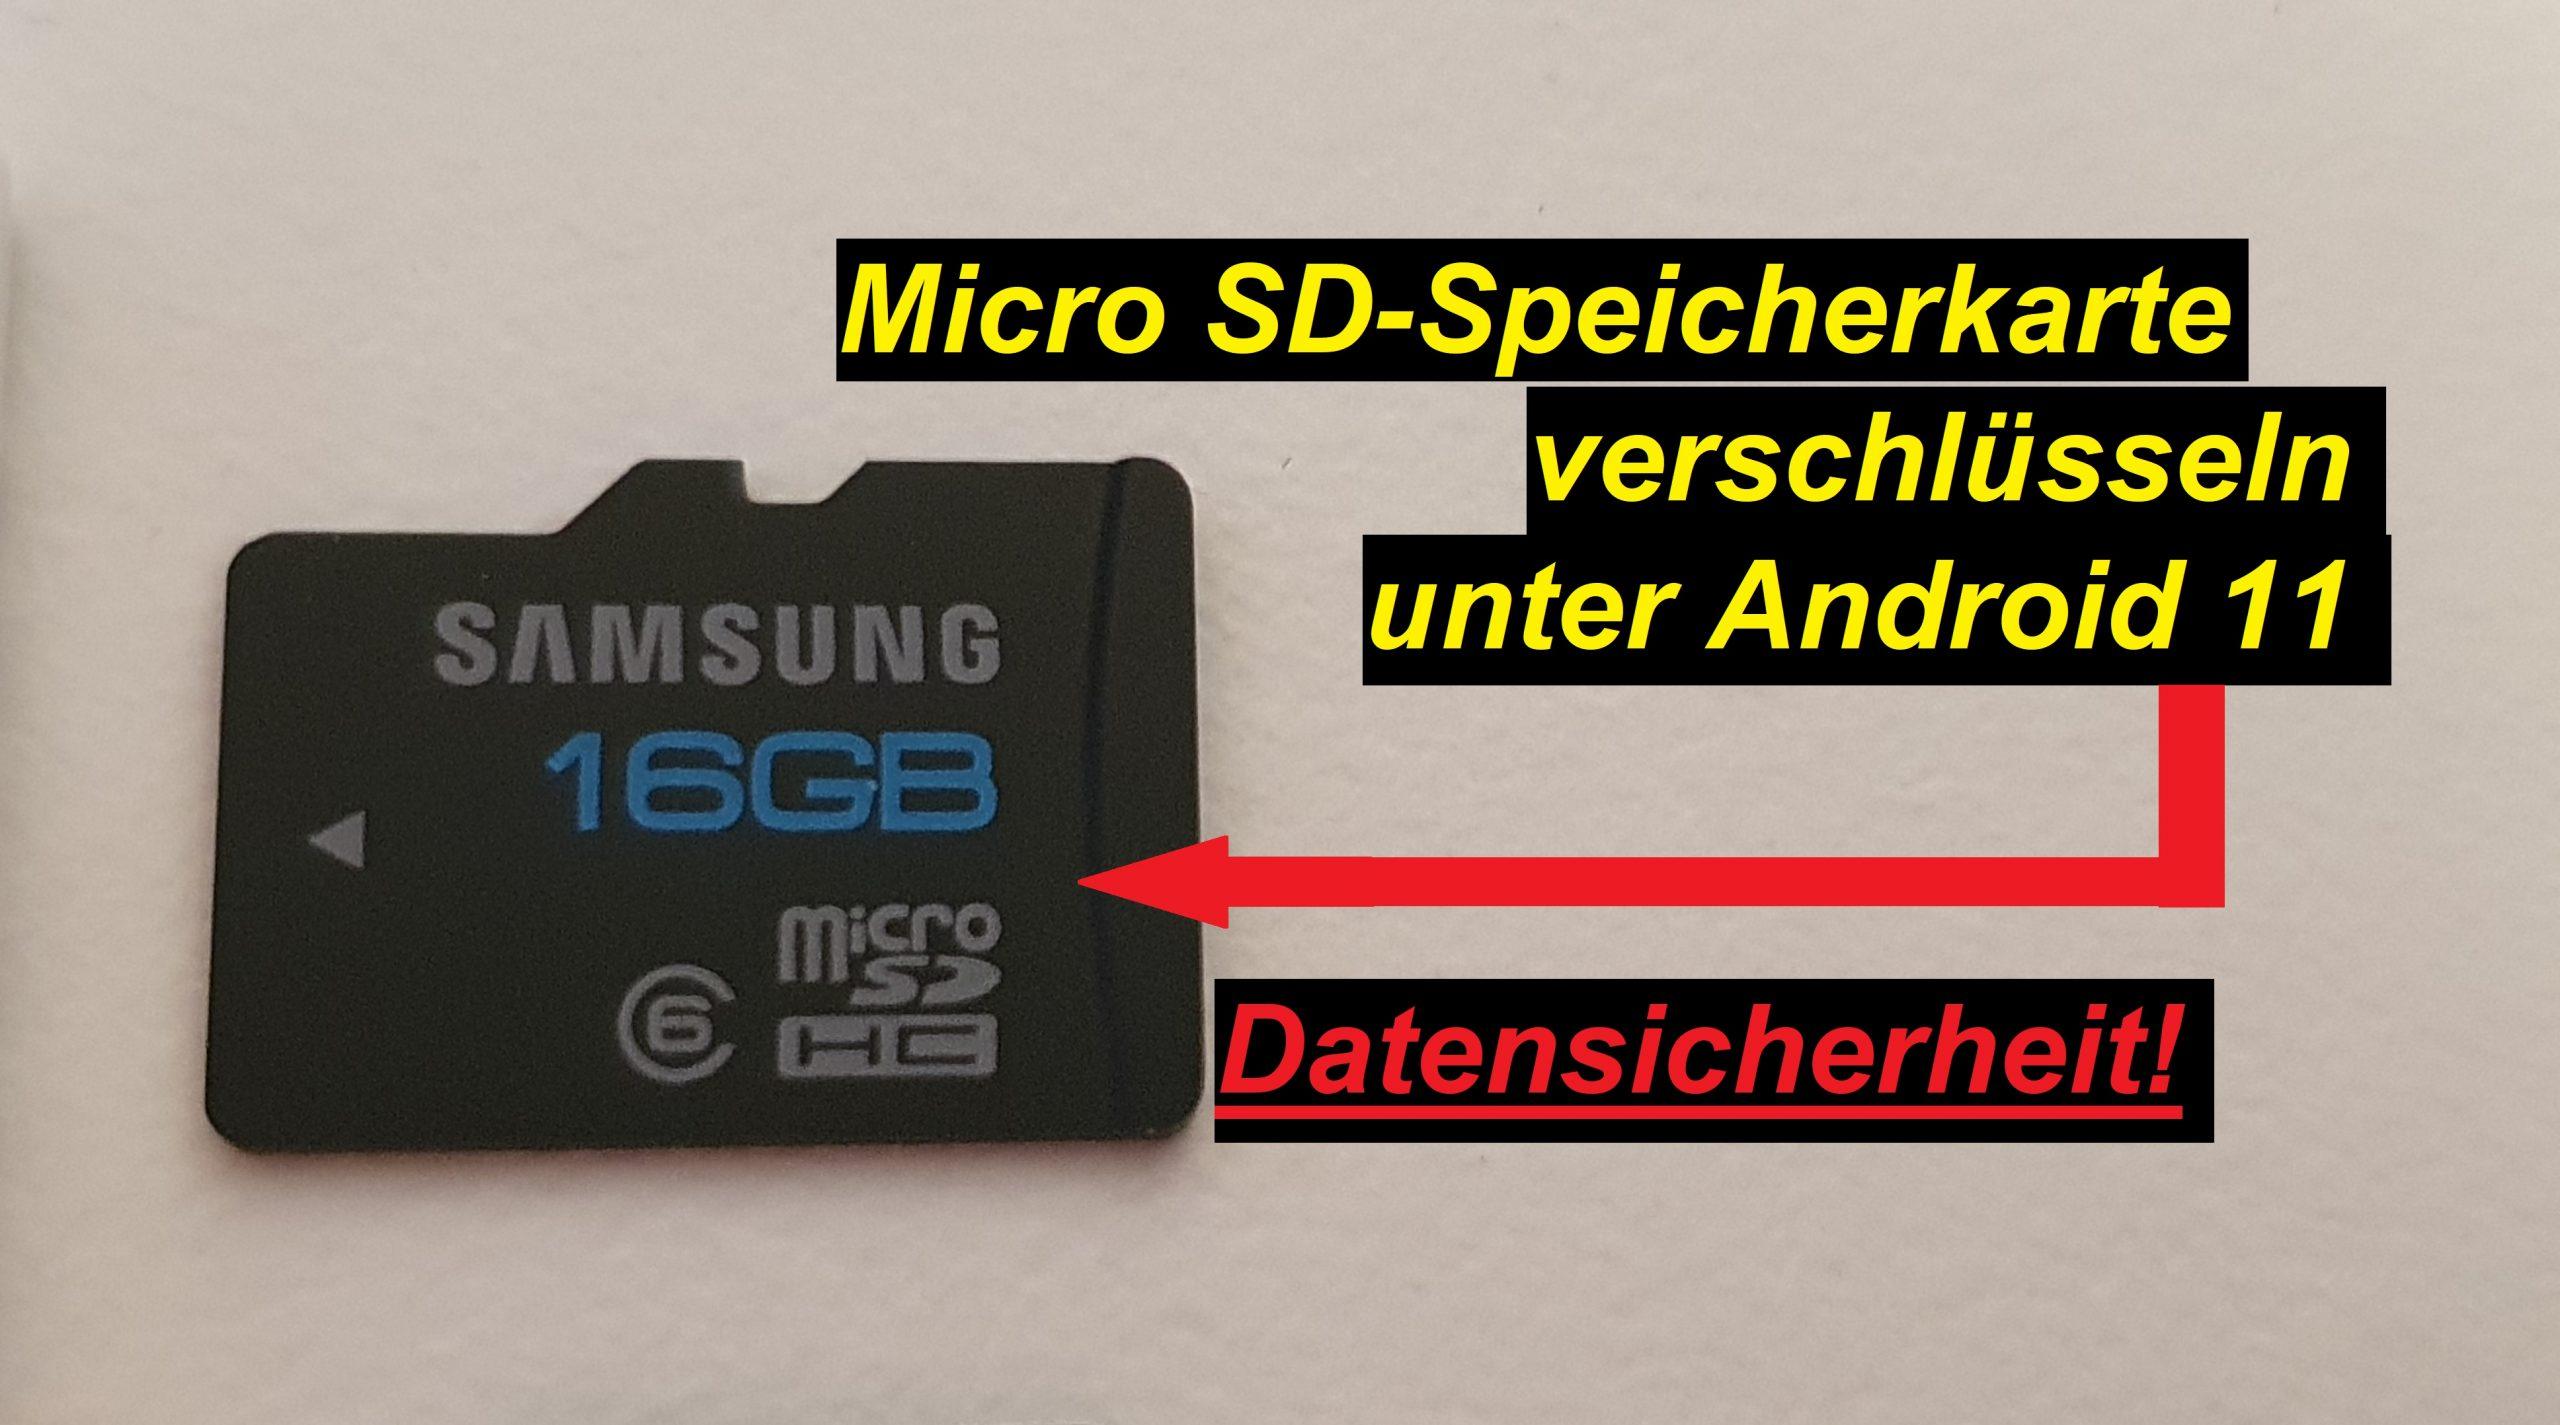 Micro SD Speicherkarte. Android 11 verschlüsseln - Tutorial - SeppelPower